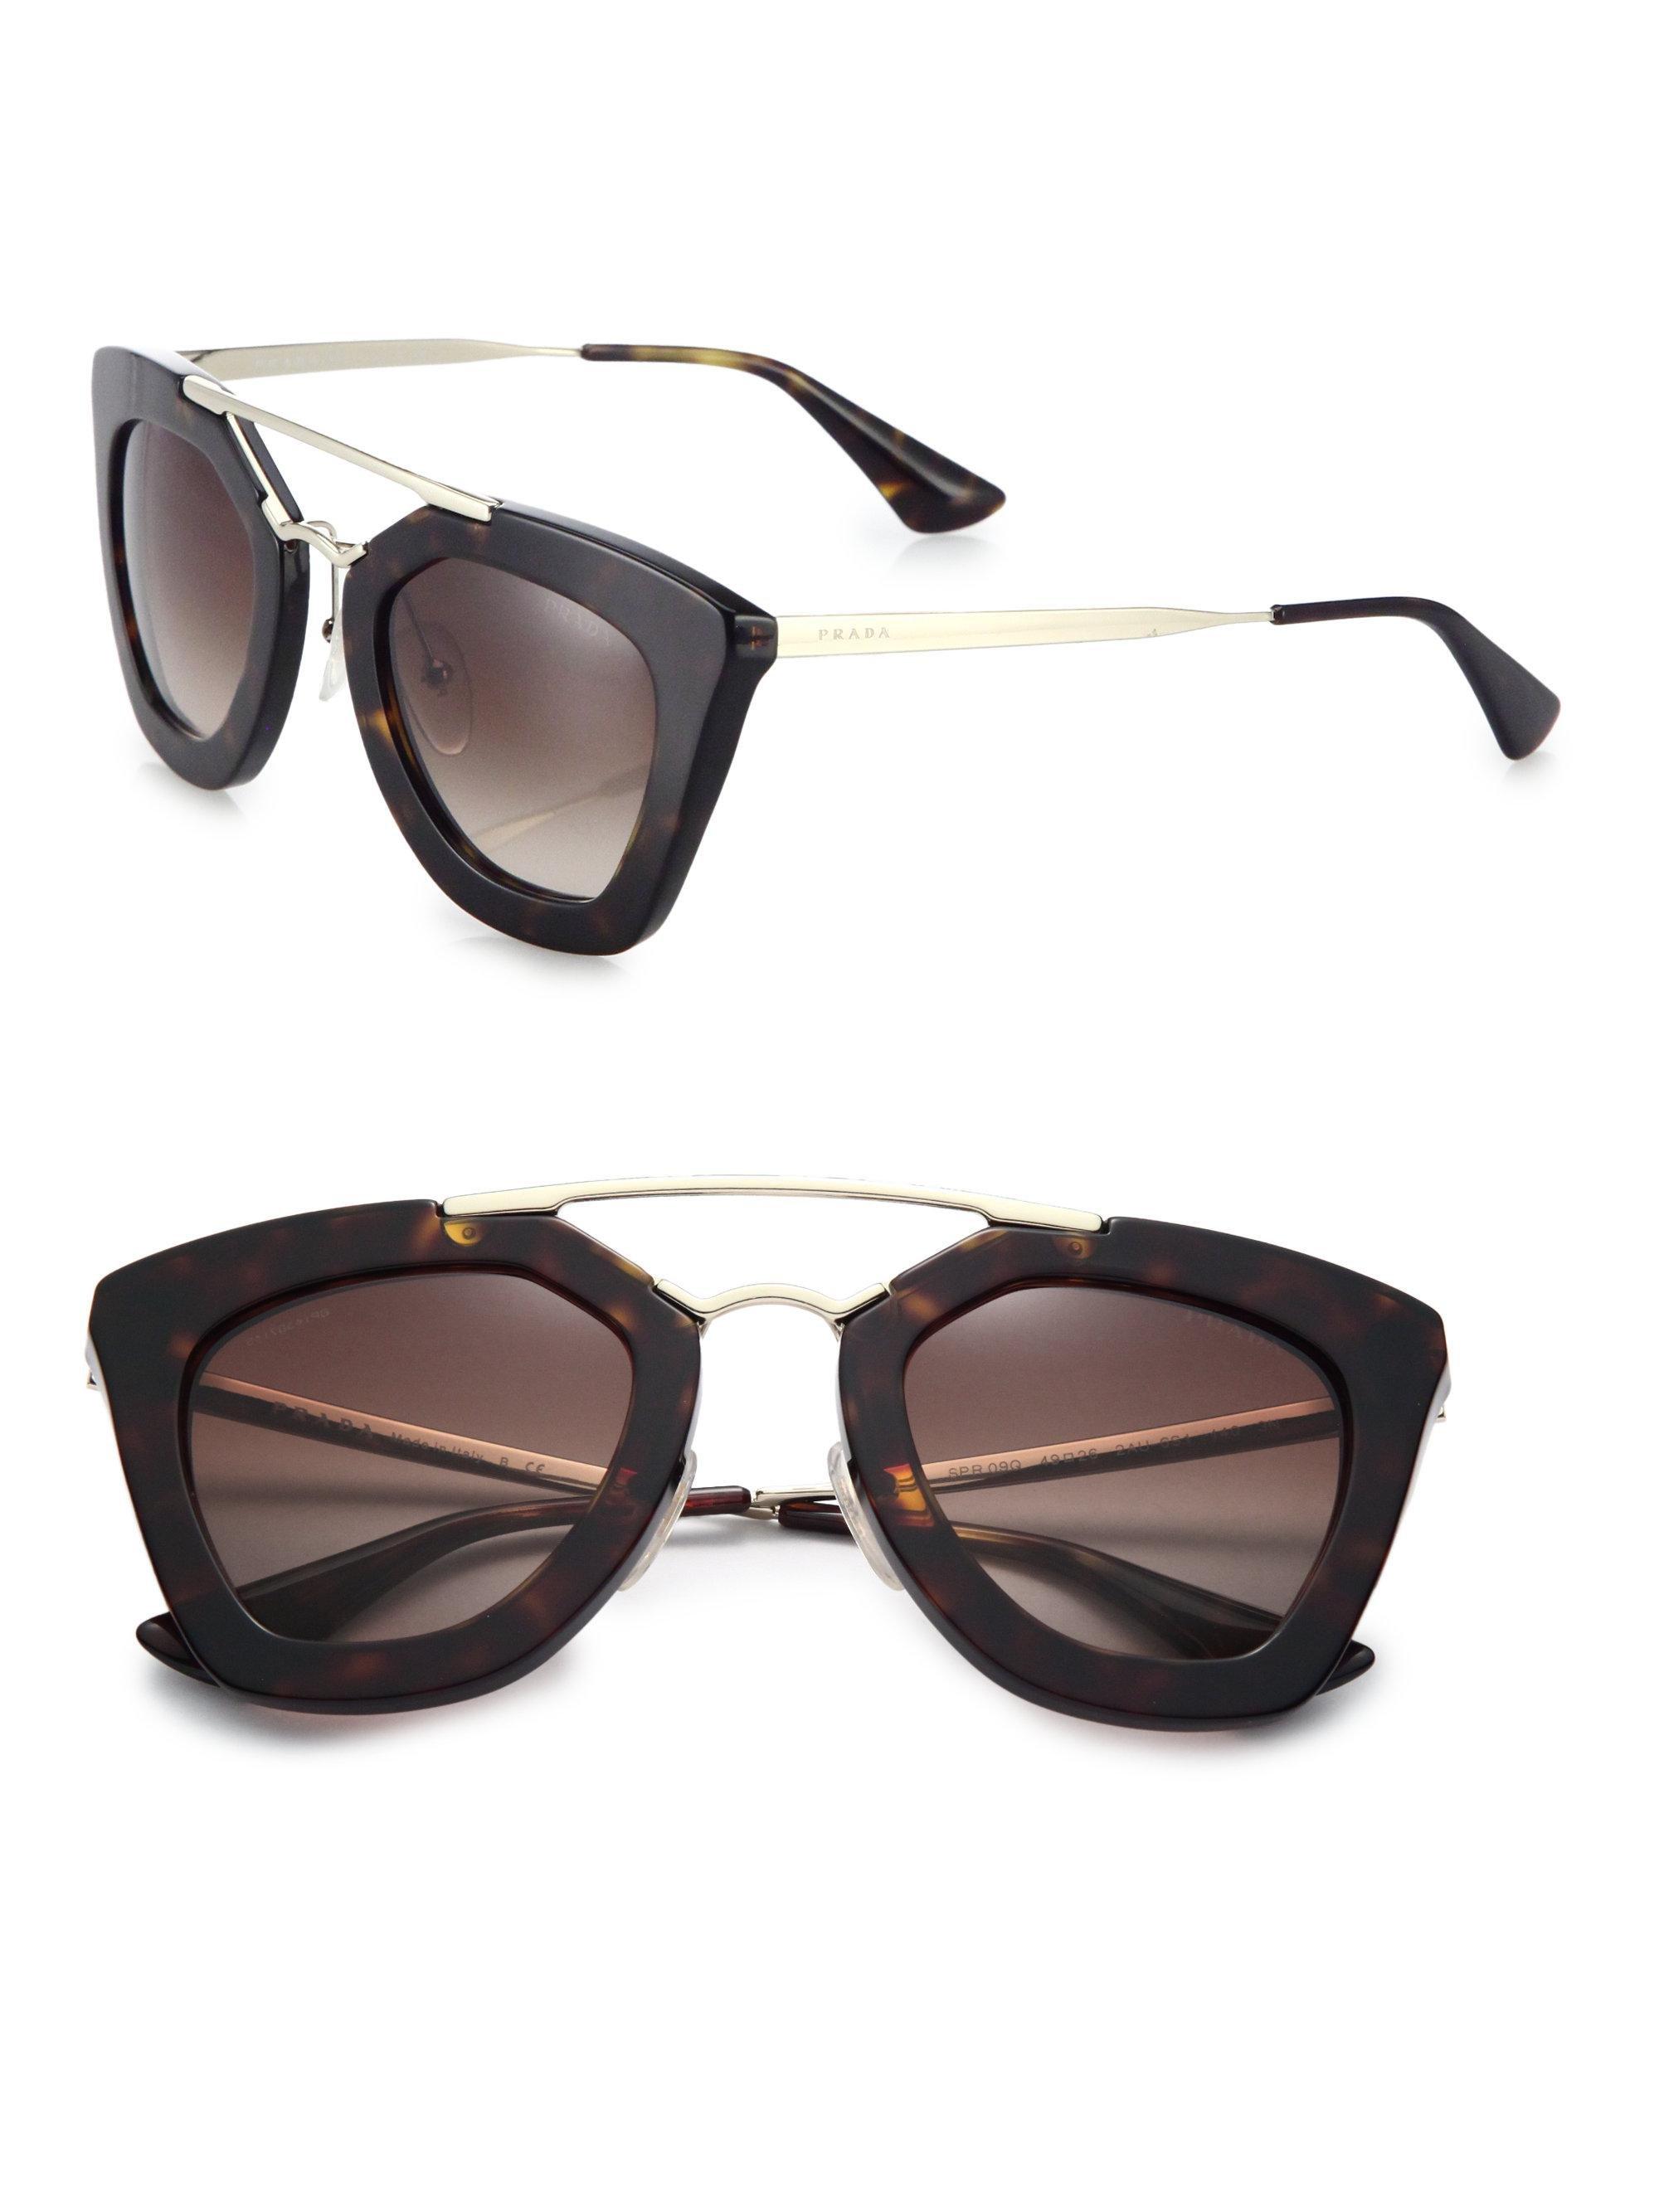 db636dbe8a ... france lyst prada cats eye sunglasses in brown f14c2 8b115 ...